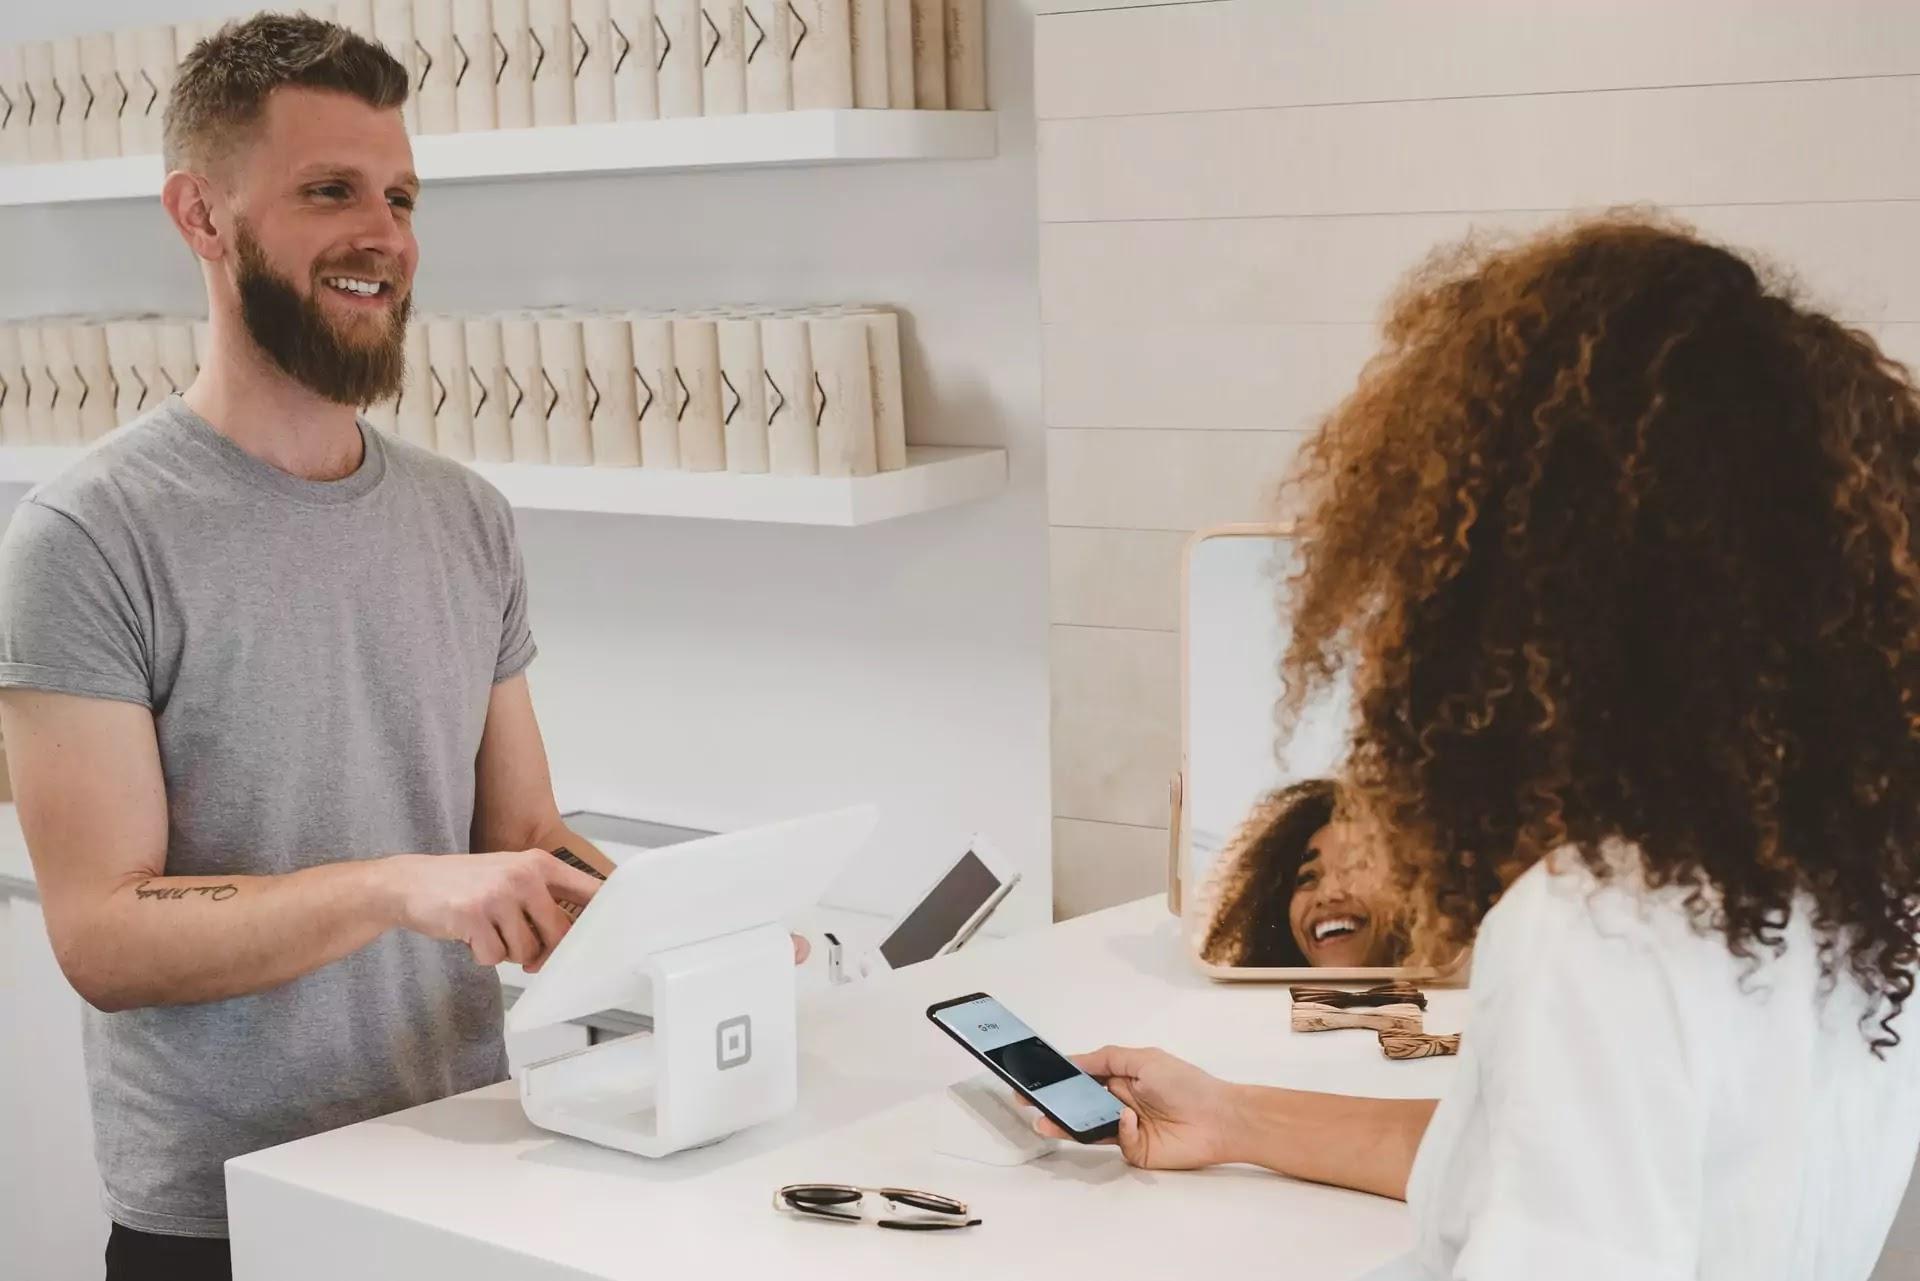 images of customer interaction recalls customer